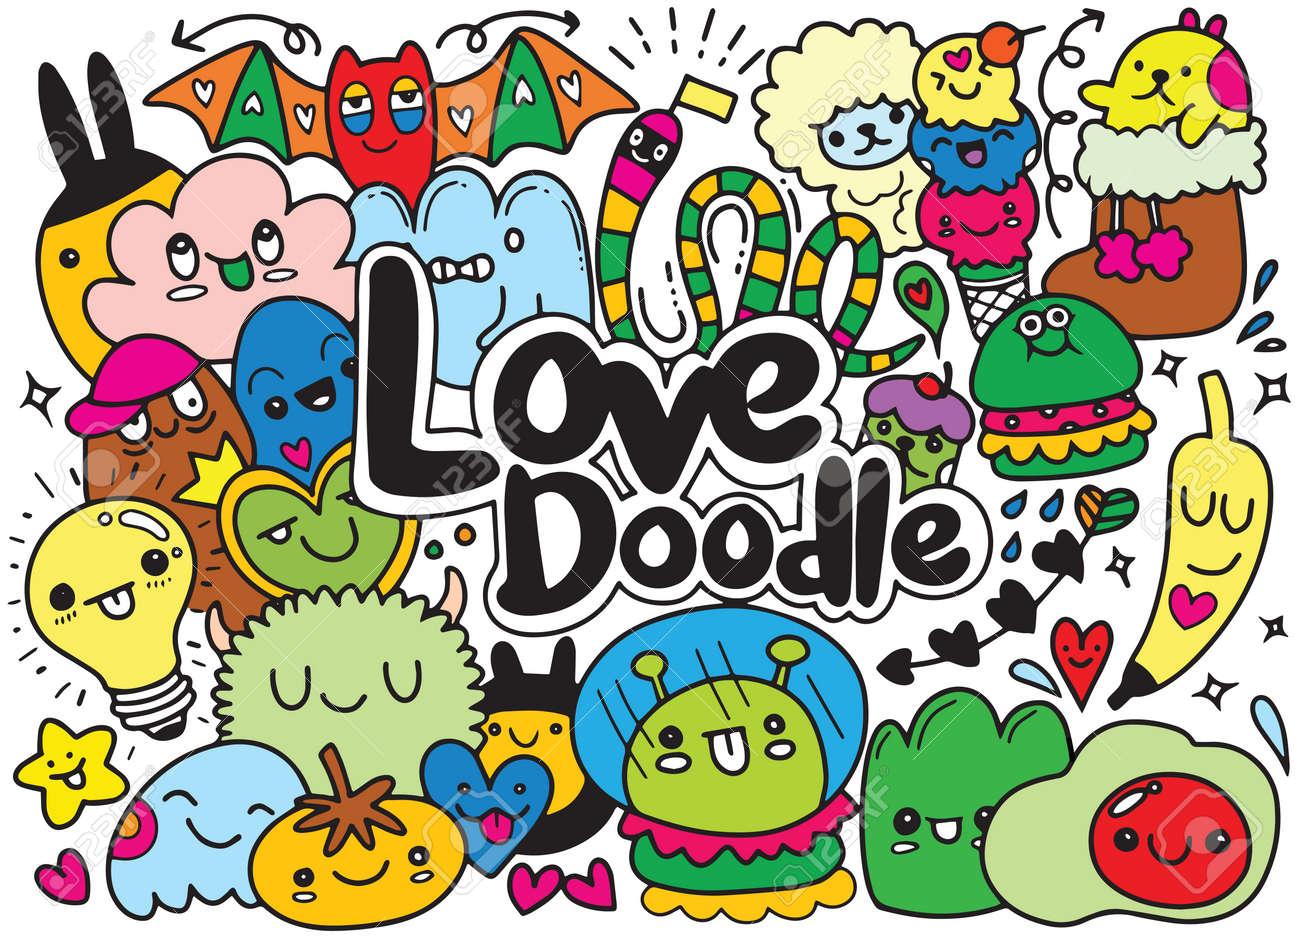 Conjunto De Divertidos Monstruos Lindos Extranjeros O Animales De Fantasía Para Niños Para Colorear Libros O Camisetas